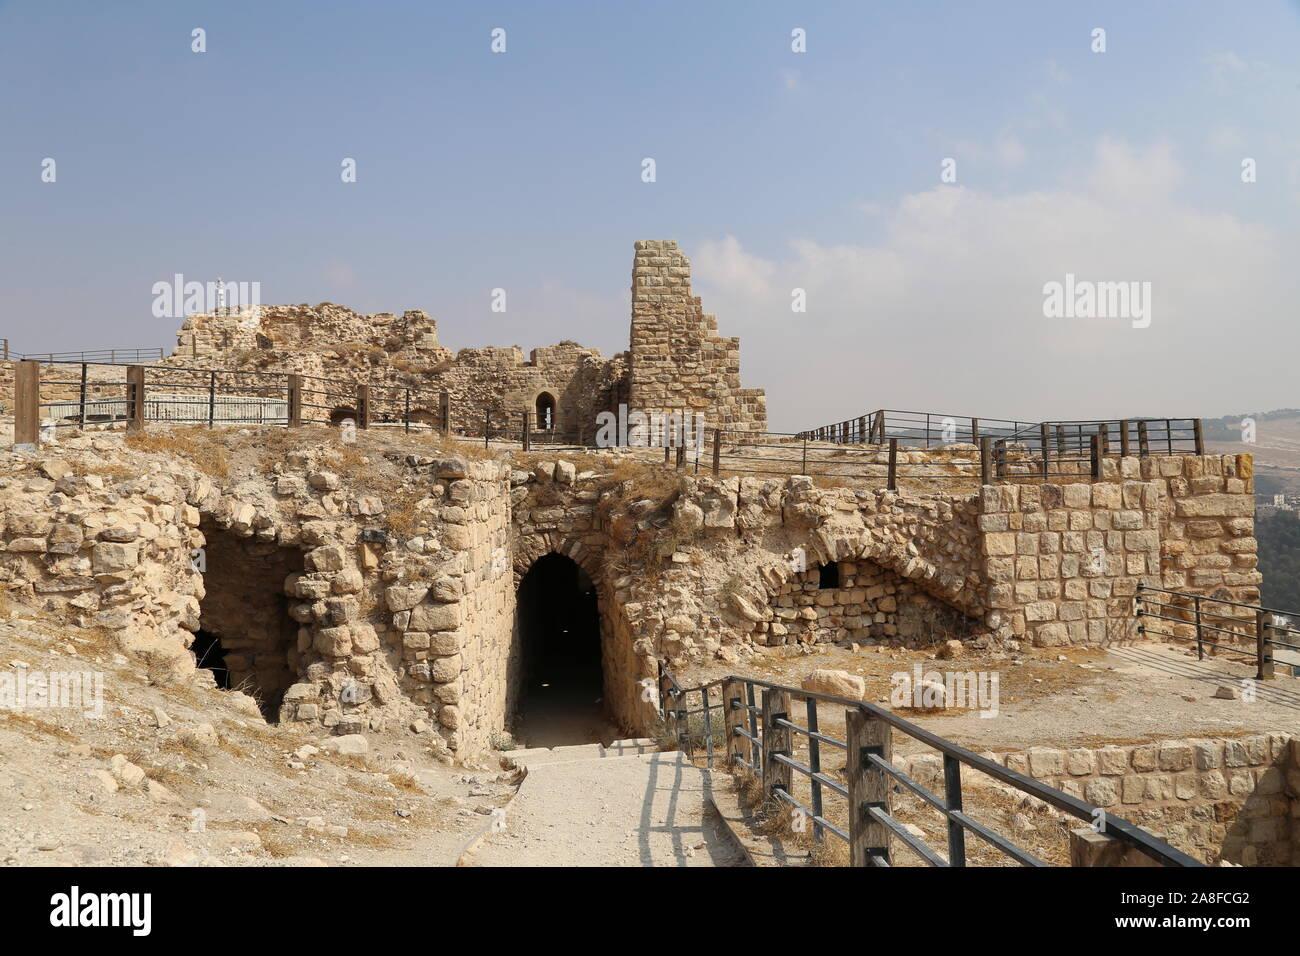 Kitchen and Barracks, Karak Castle, Al Karak, Karak Governorate, Jordan, Middle East Stock Photo